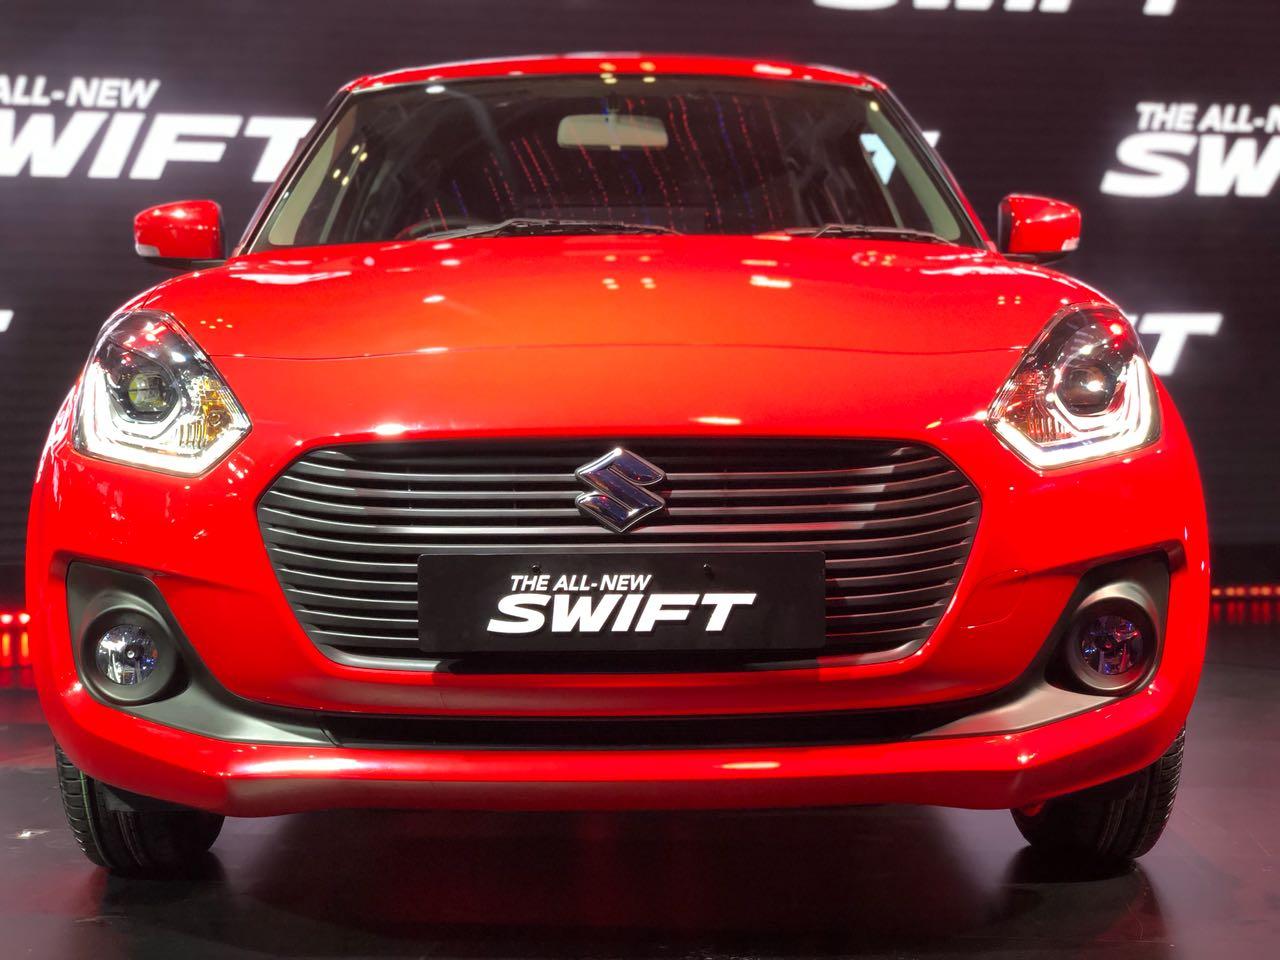 Maruti Suzuki New Price List